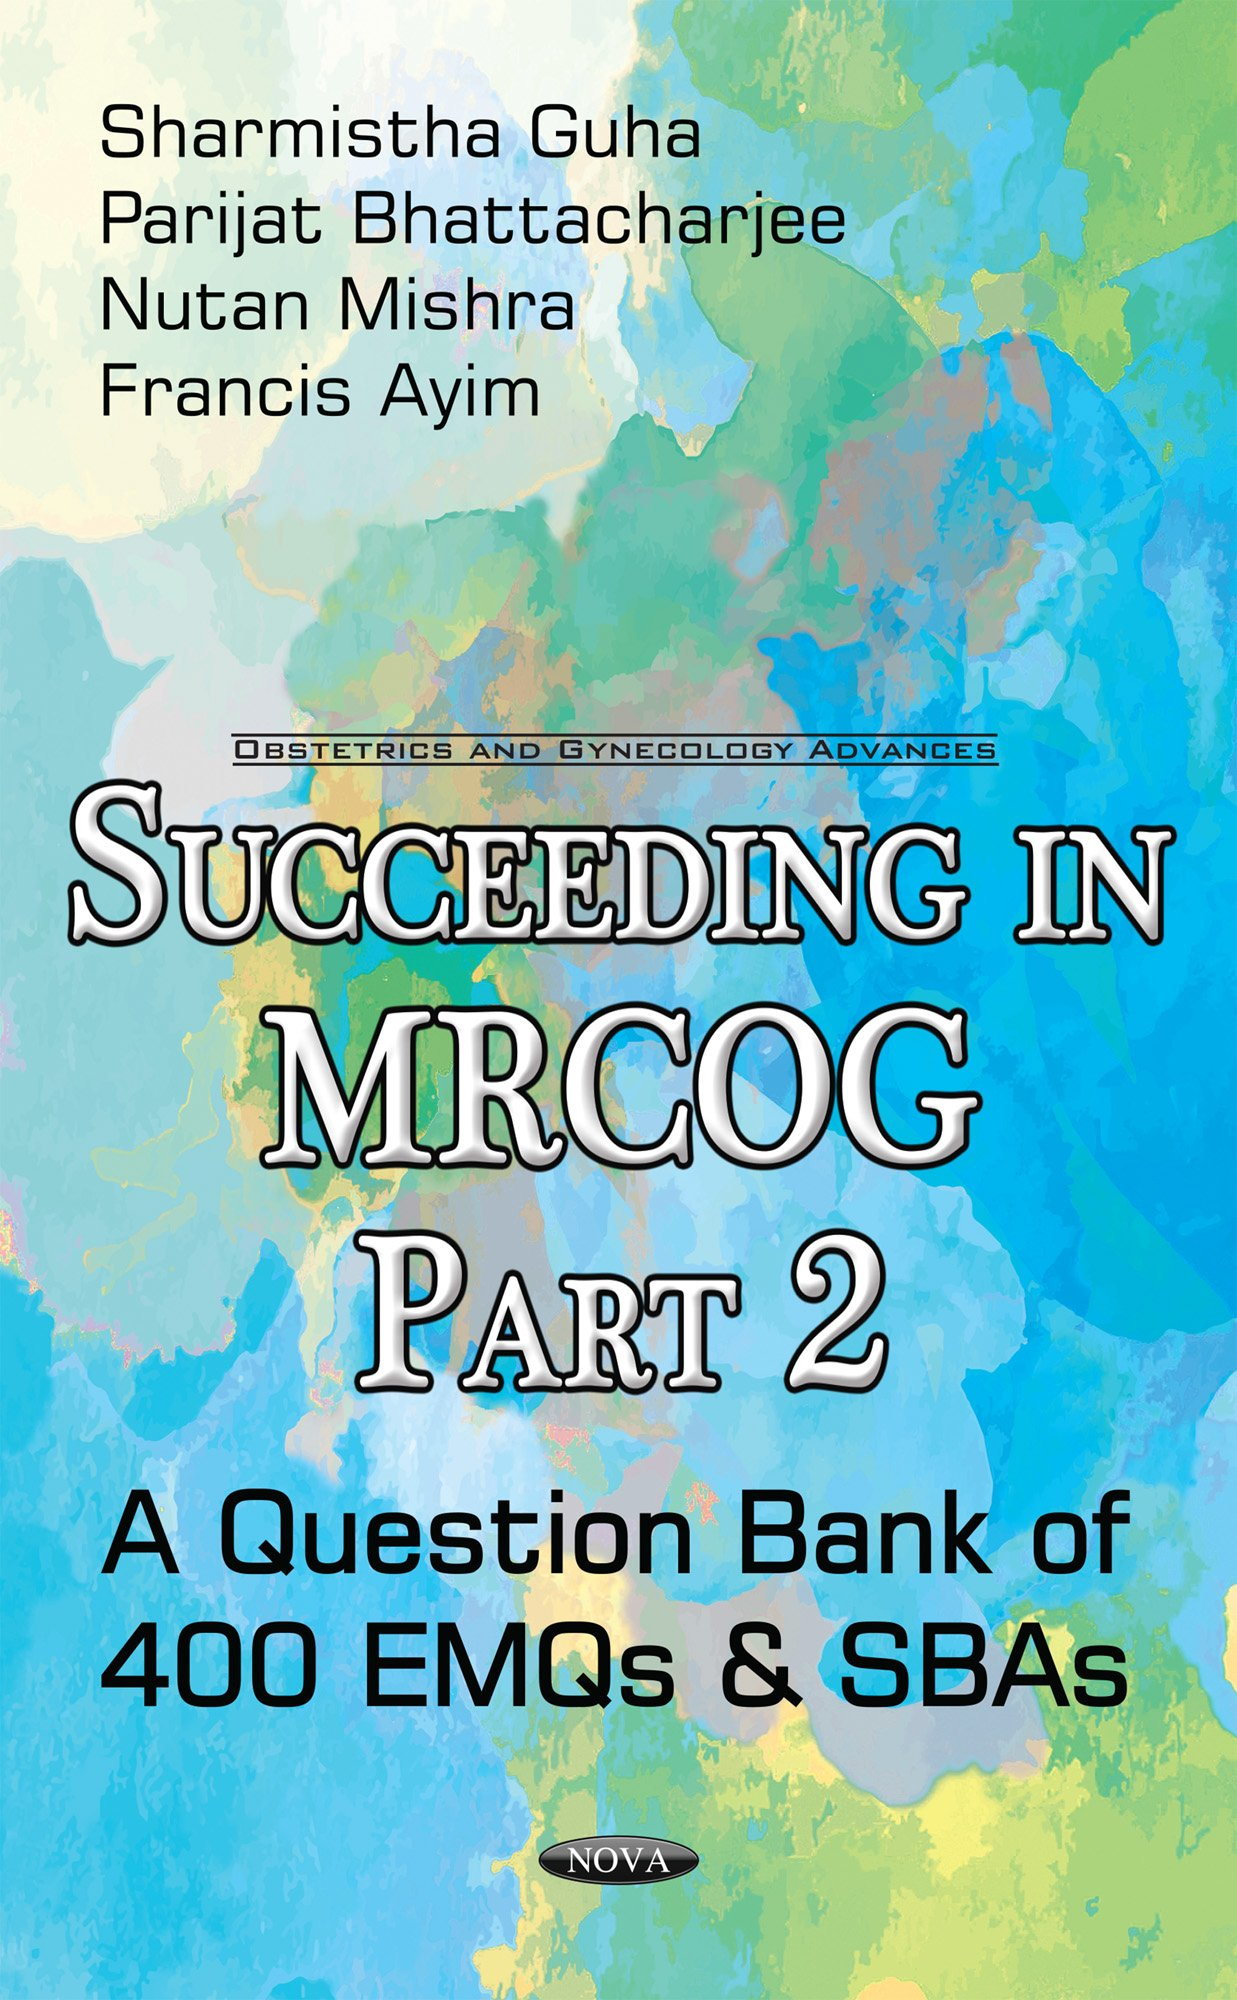 Sba questions for the part 2 mrcog manual array buy succeeding in mrcog part 2 a question bank of 400 emqs u0026 sbas fandeluxe Gallery